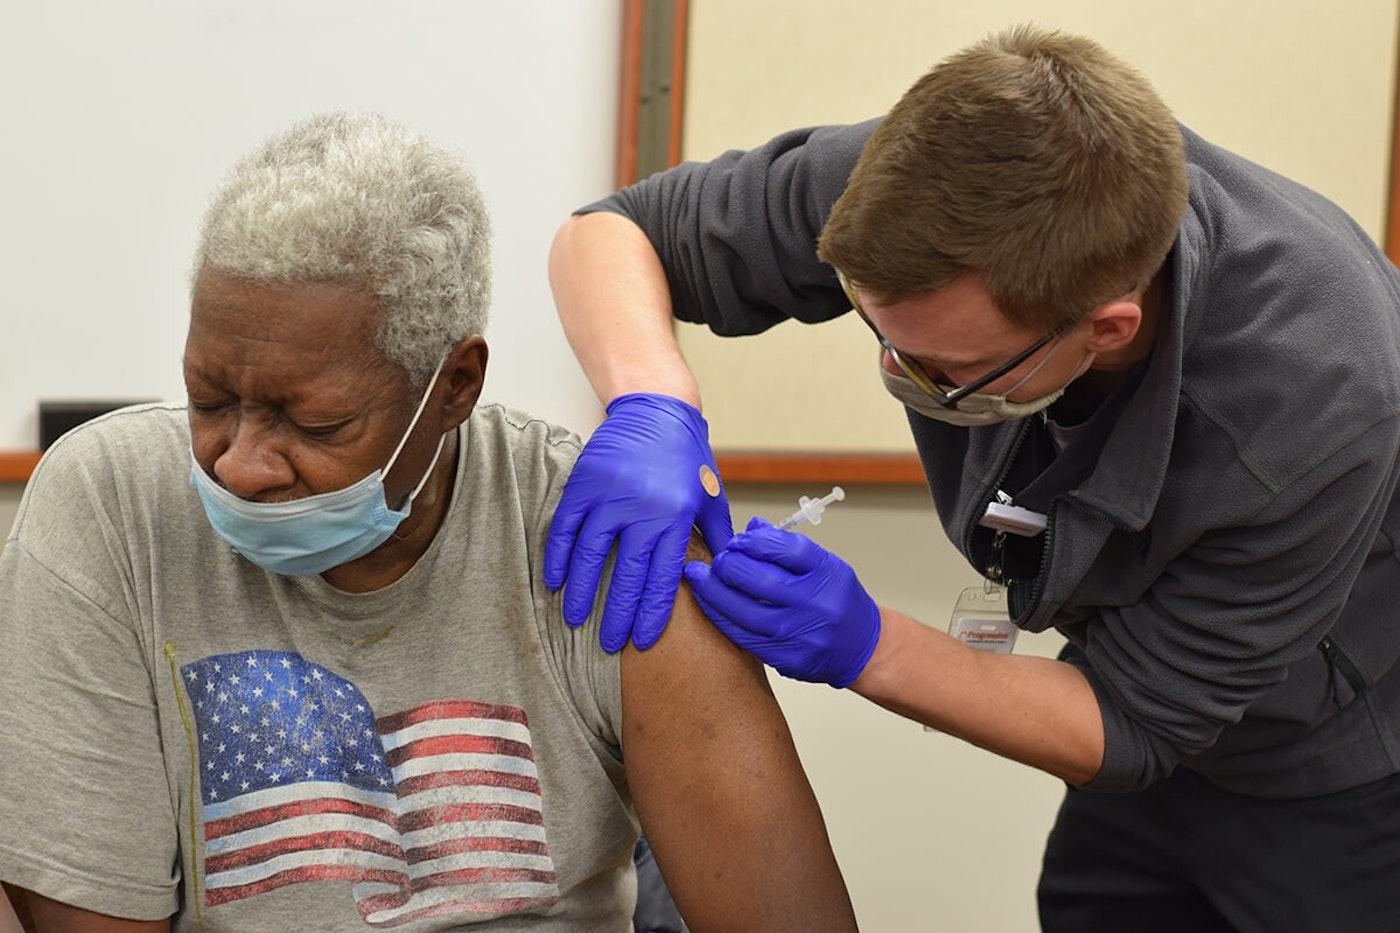 Ted Crutcher, 70, of Milwaukee, gets a dose of Pfizer's COVID-19 vaccine Feb. 4 from Jordan Bretzmann, a nurse at Progressive Community Health Centers. (Photo by Jonathon Sadowski)